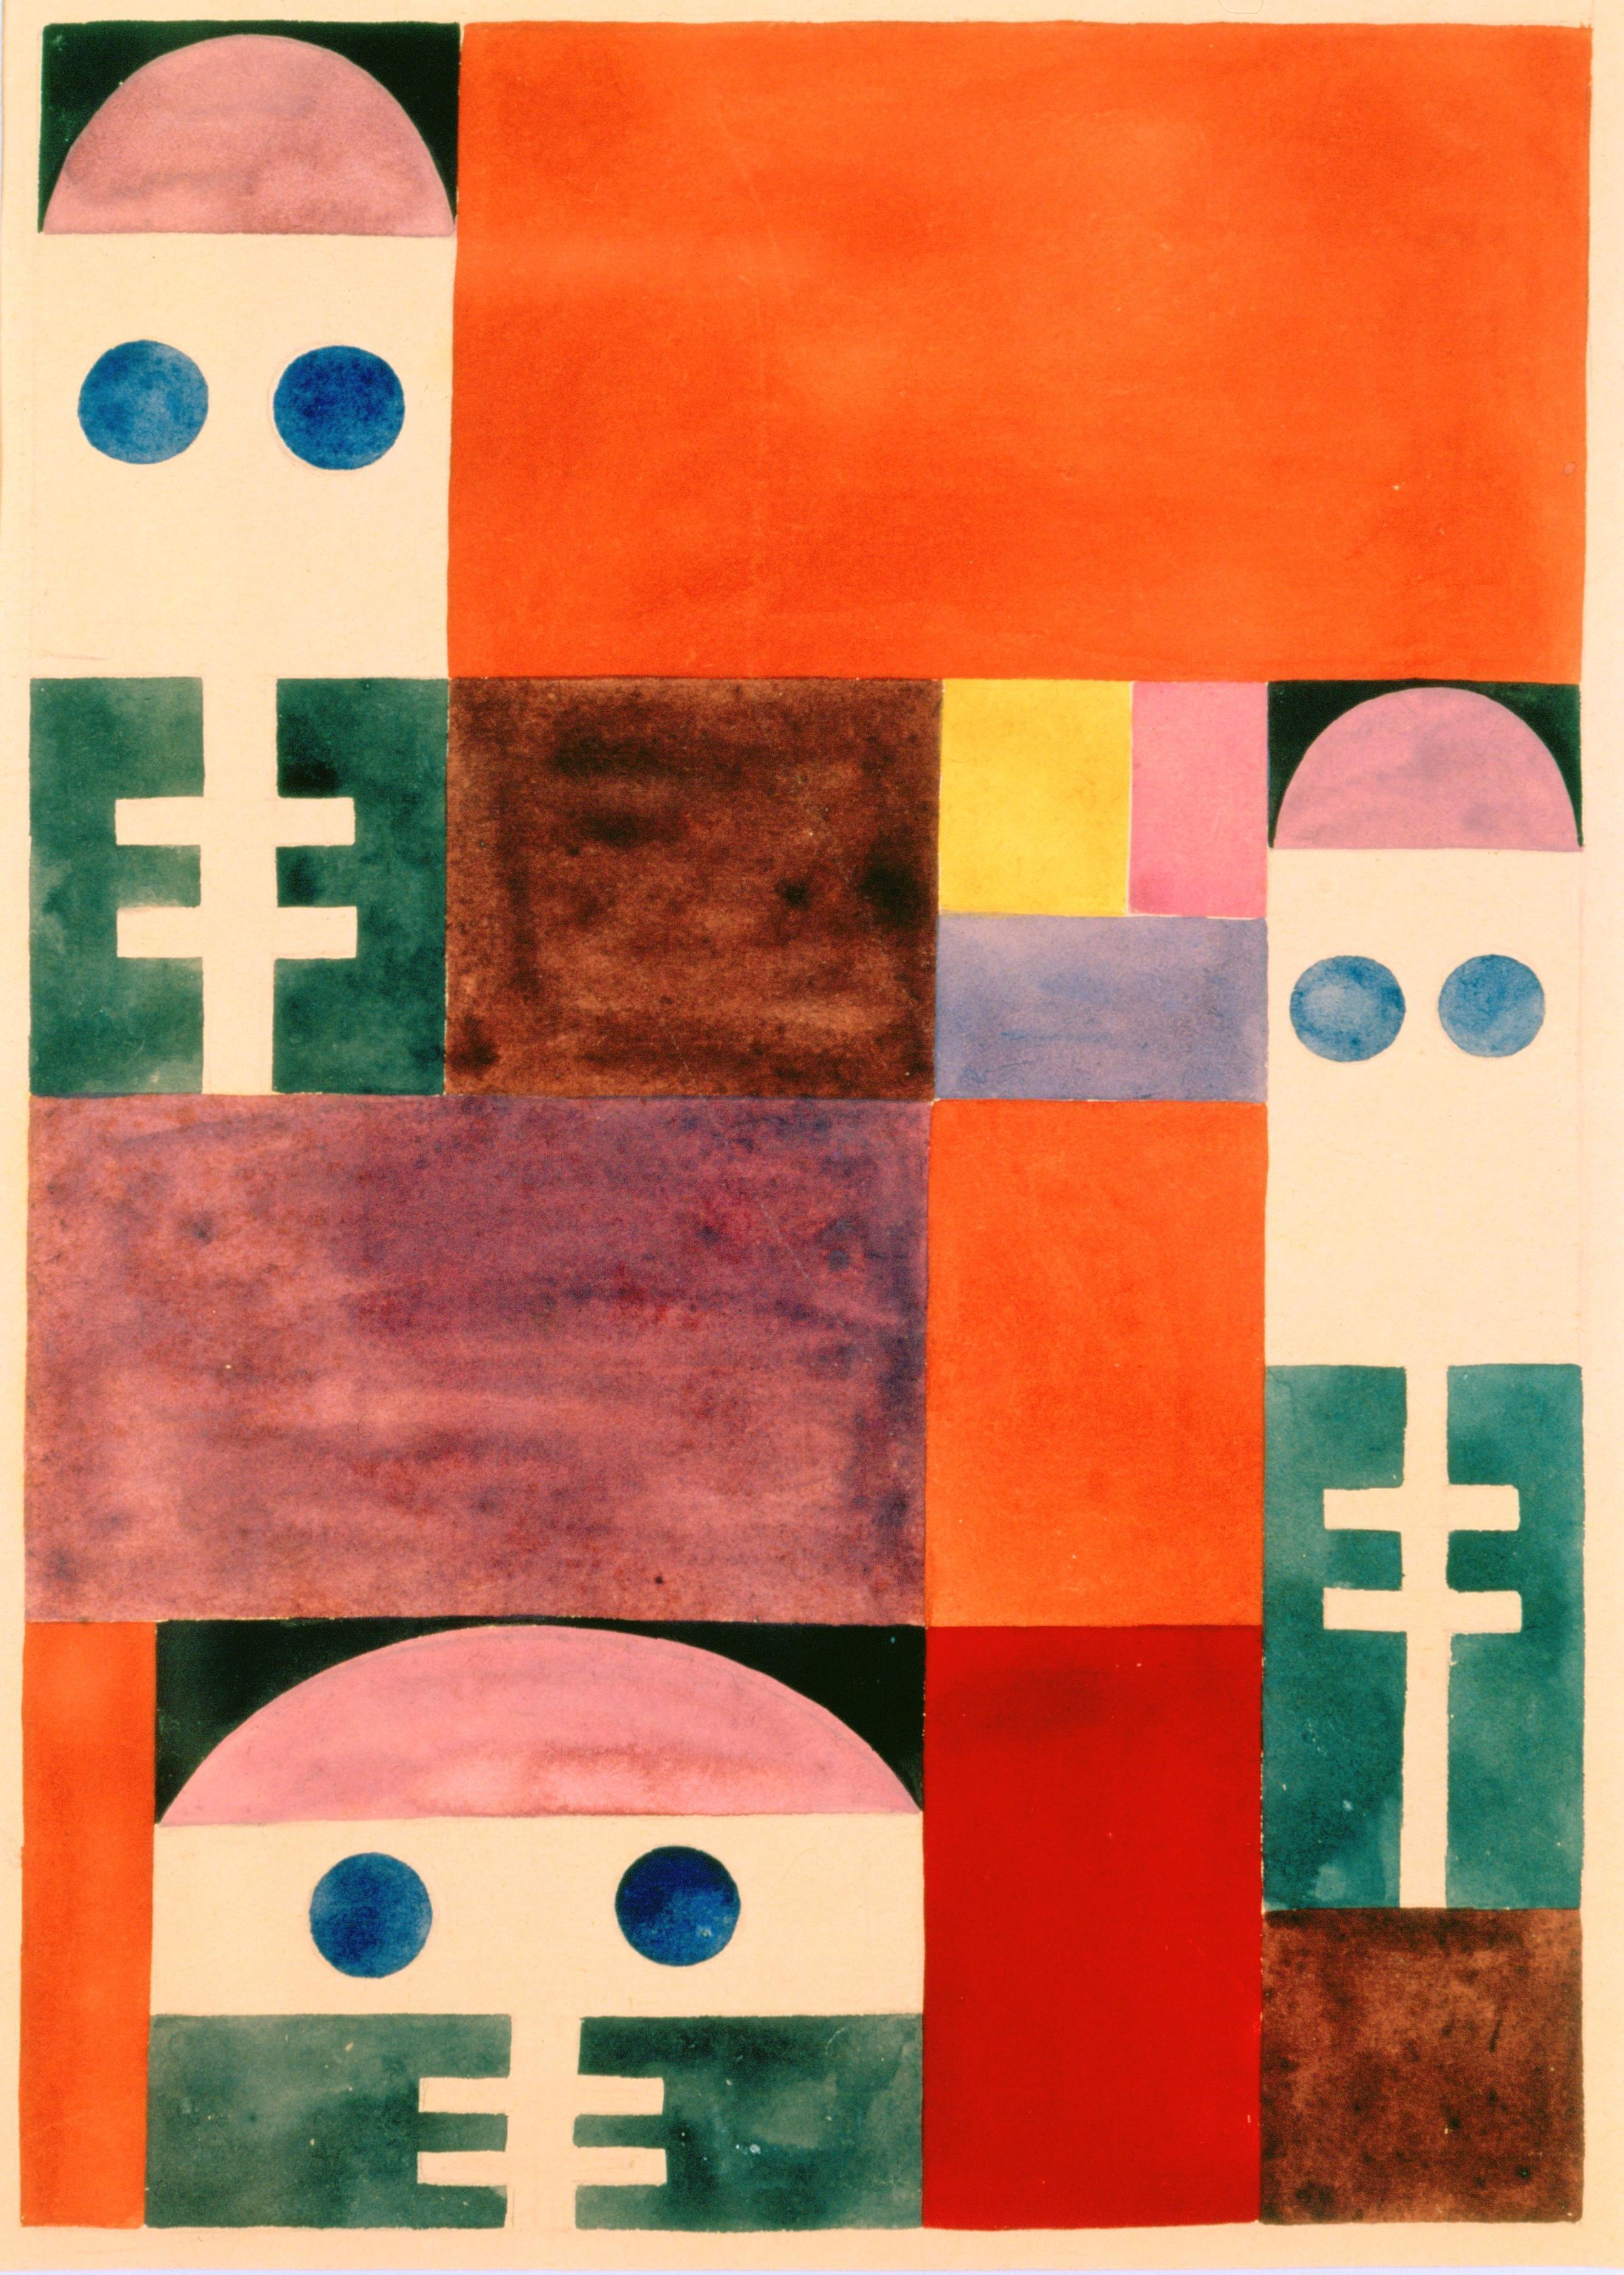 Sophie Taeuber-Arp, Motifs abstraits (masques), 1917